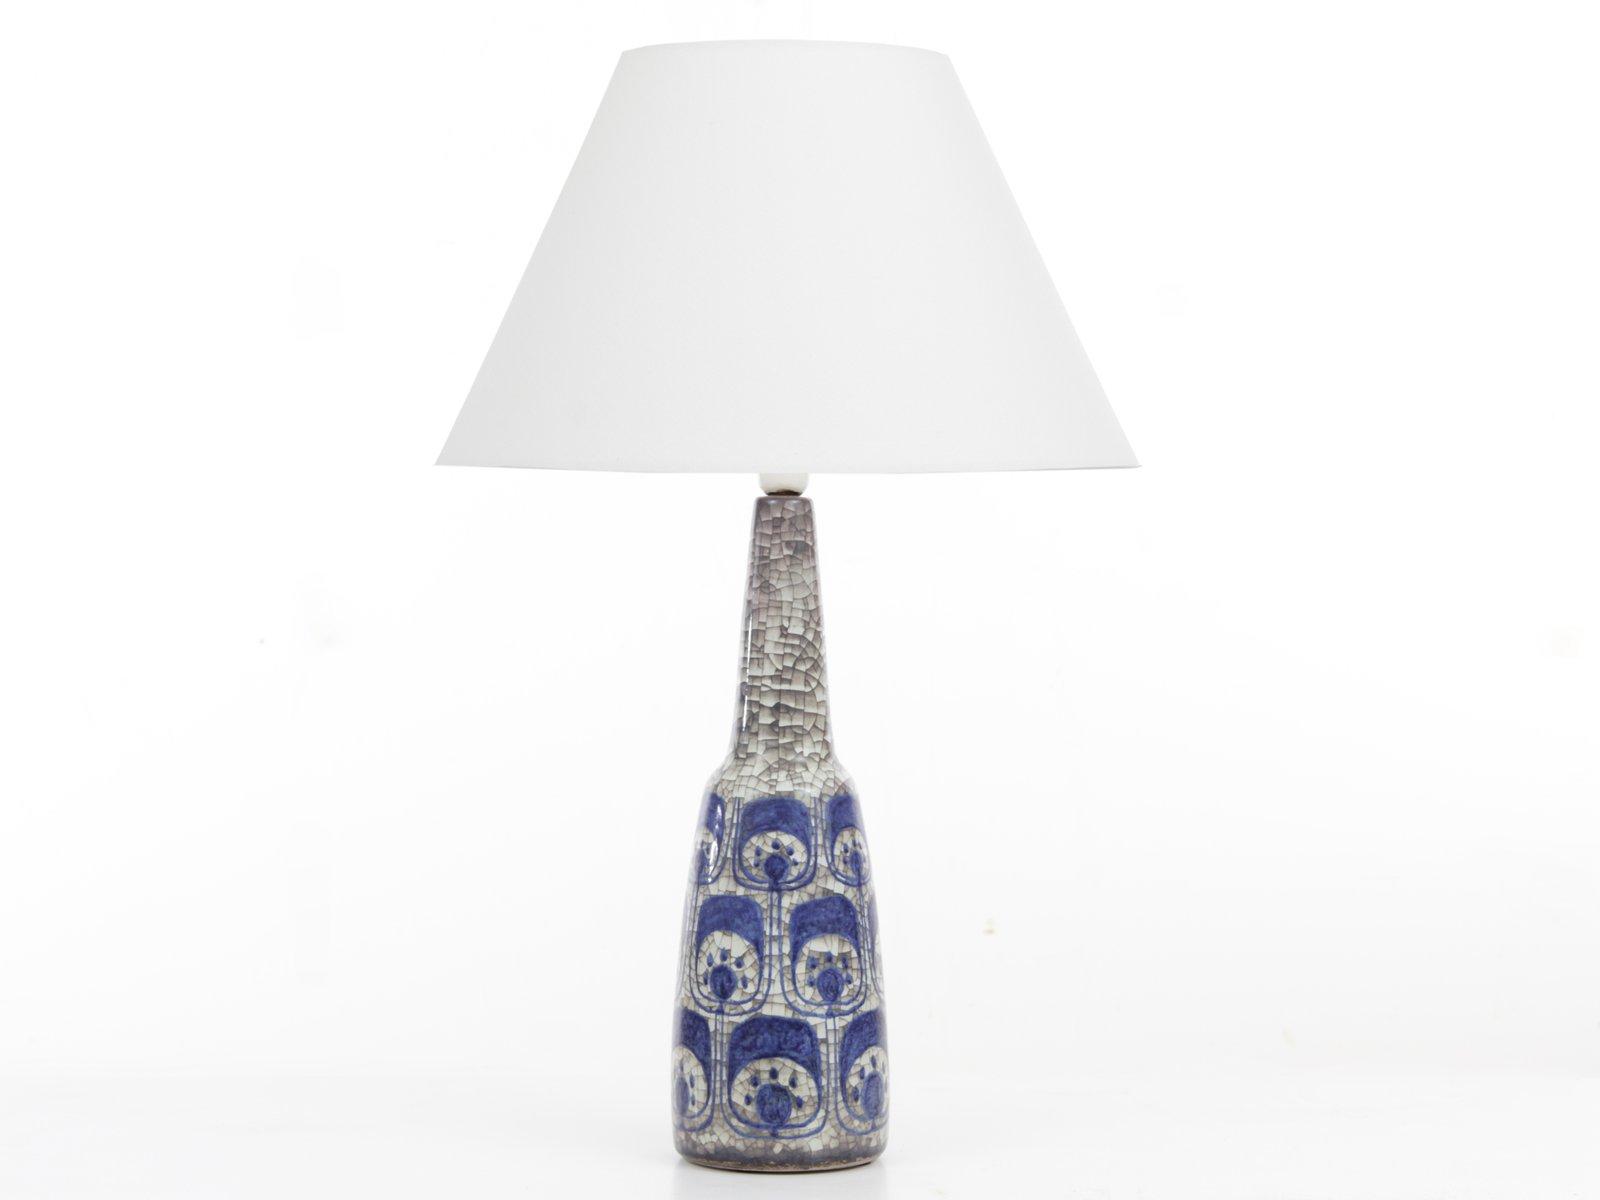 Mid Century Modern Scandinavian Ceramic Lamp By Marianne Starck For Michael Andersen Son